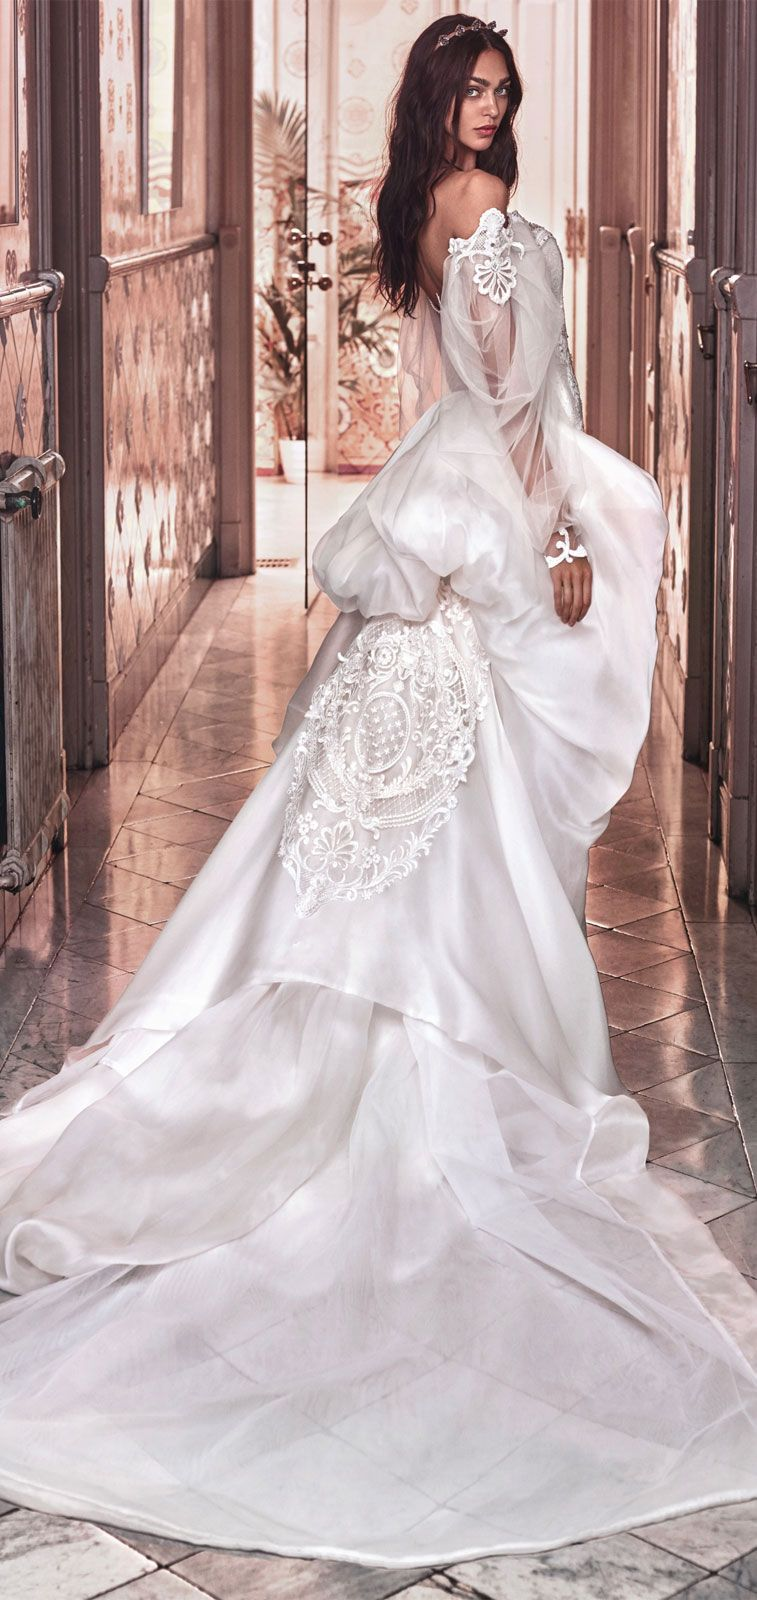 Off the shoulder sweetheart neckline Victorian mermaid wedding gown #wedding #weddingdress #weddinggowns